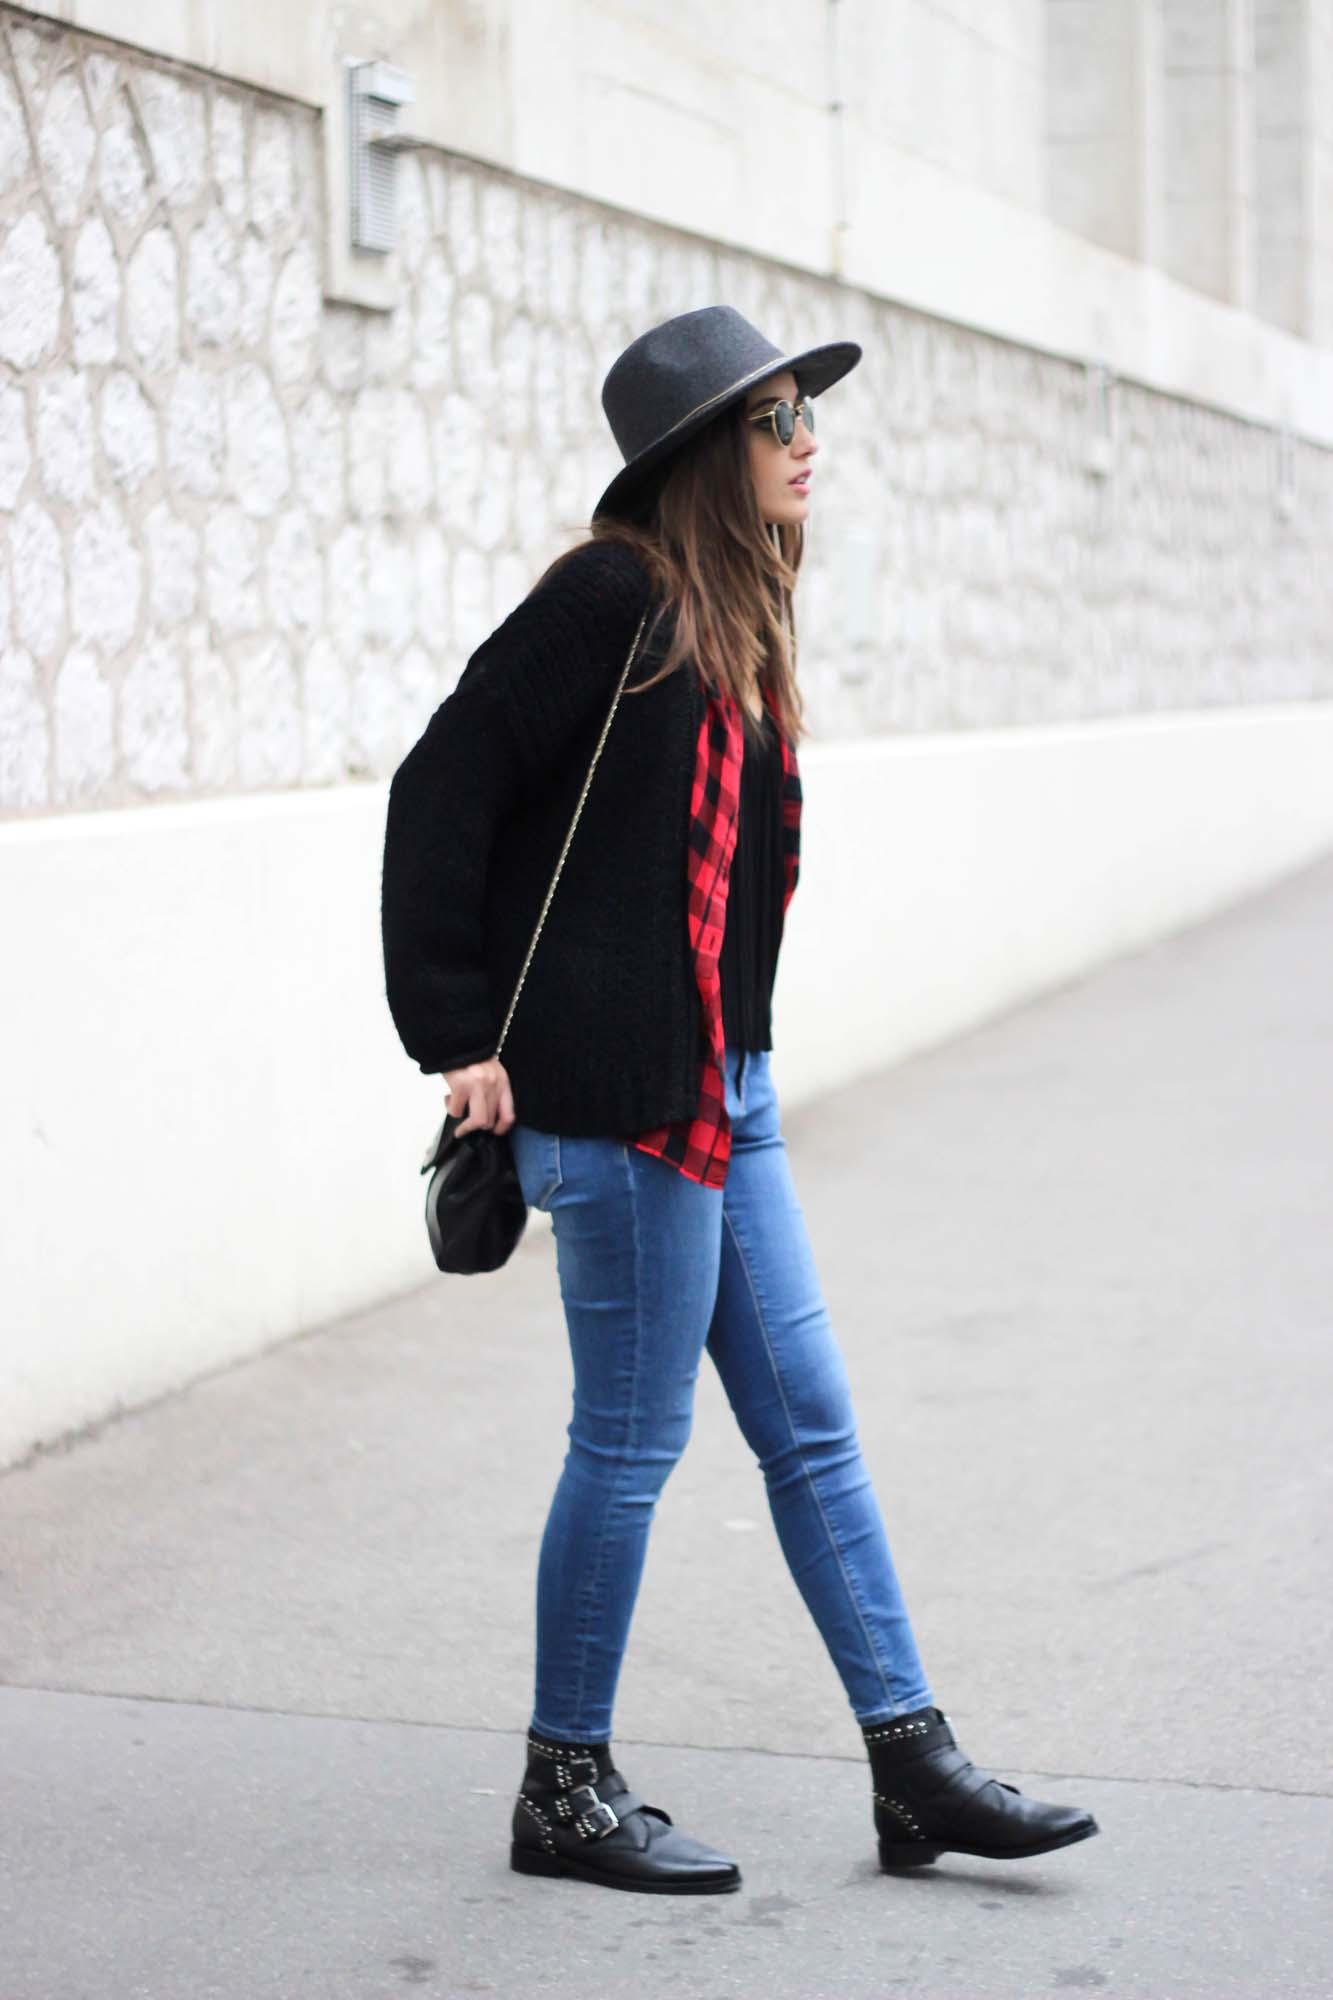 blog-mode-look-tendance-chemise-carreaux